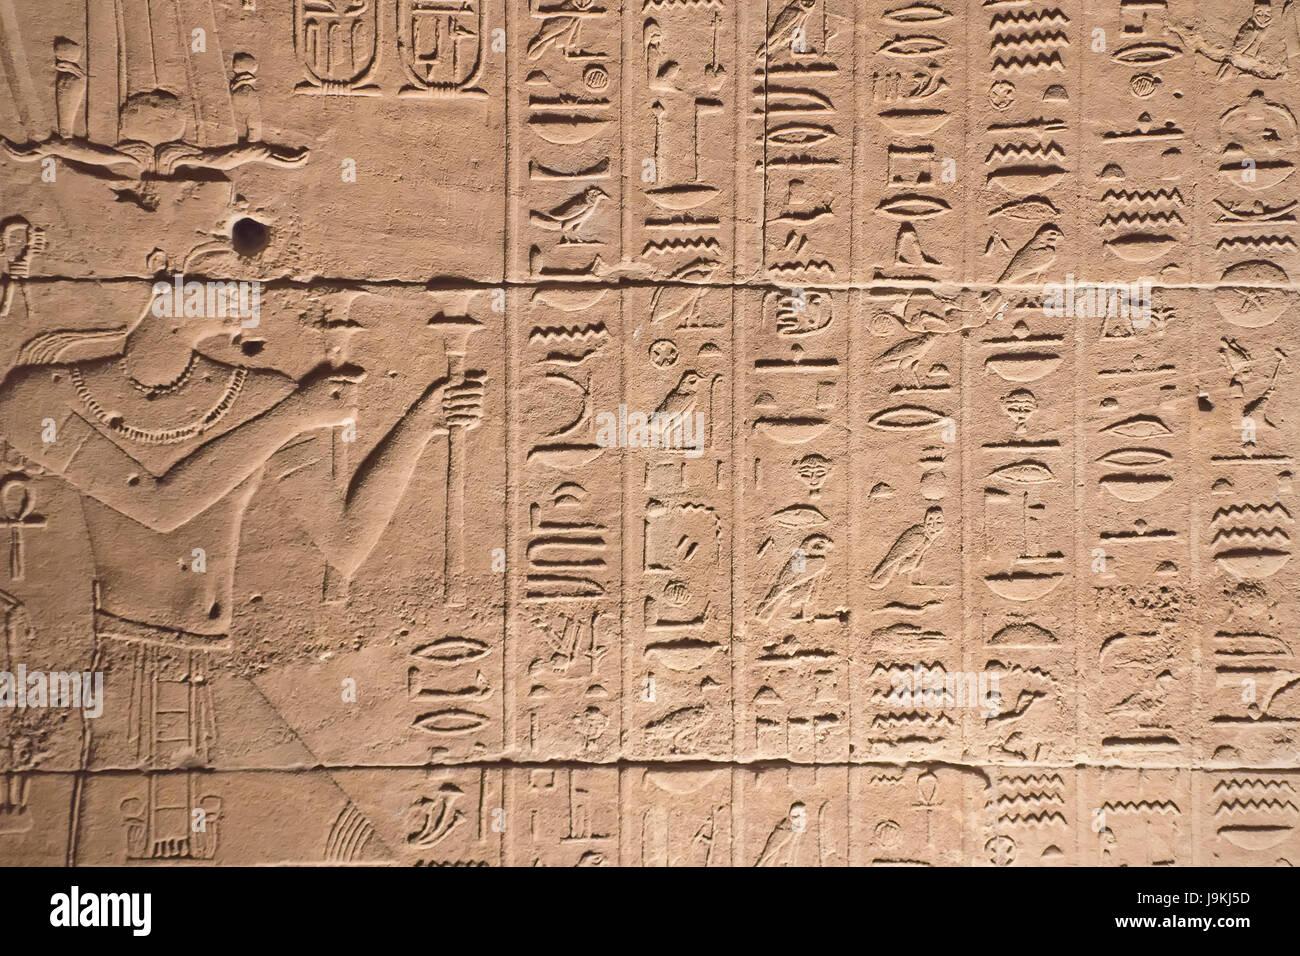 travel, art, egypt, history, pictogram, symbol, pictograph, trade